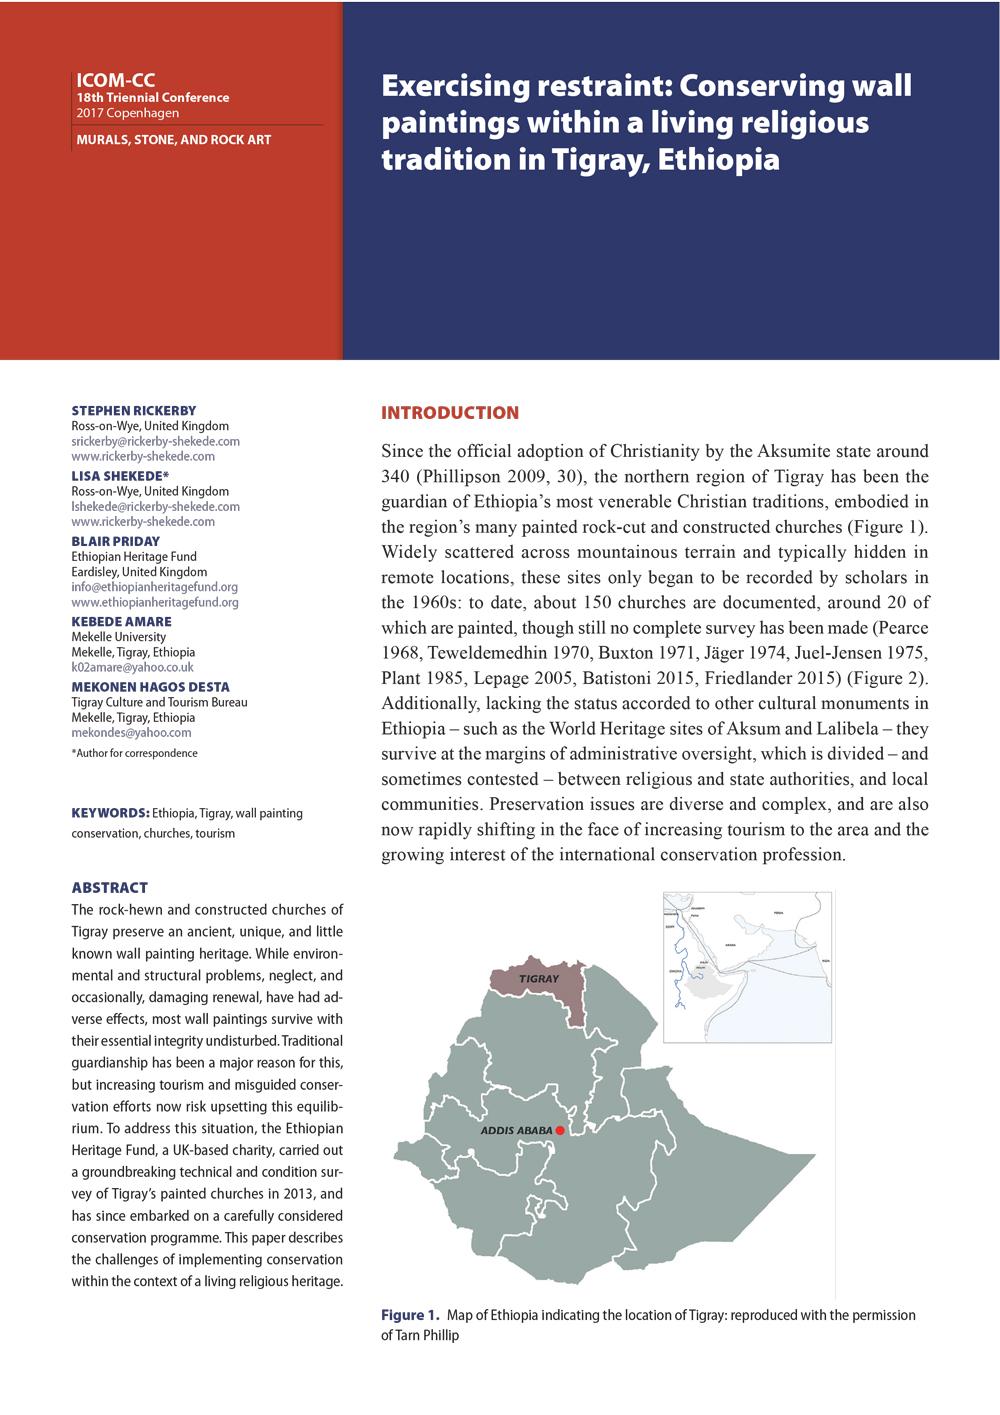 Ethiopian Heritage Fund - Tigray Map image